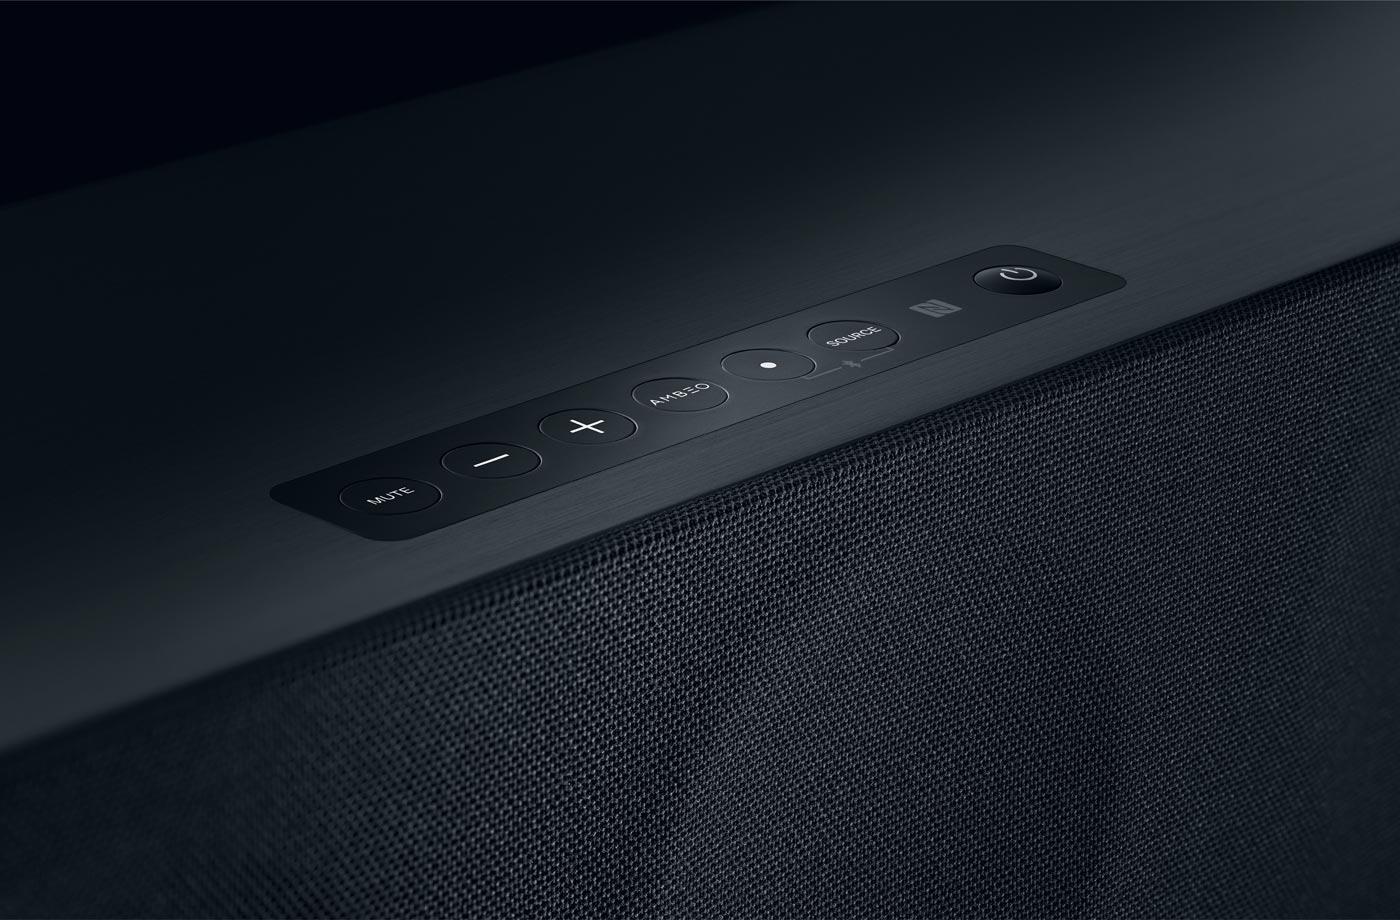 interaction design of the ambeo soundbar